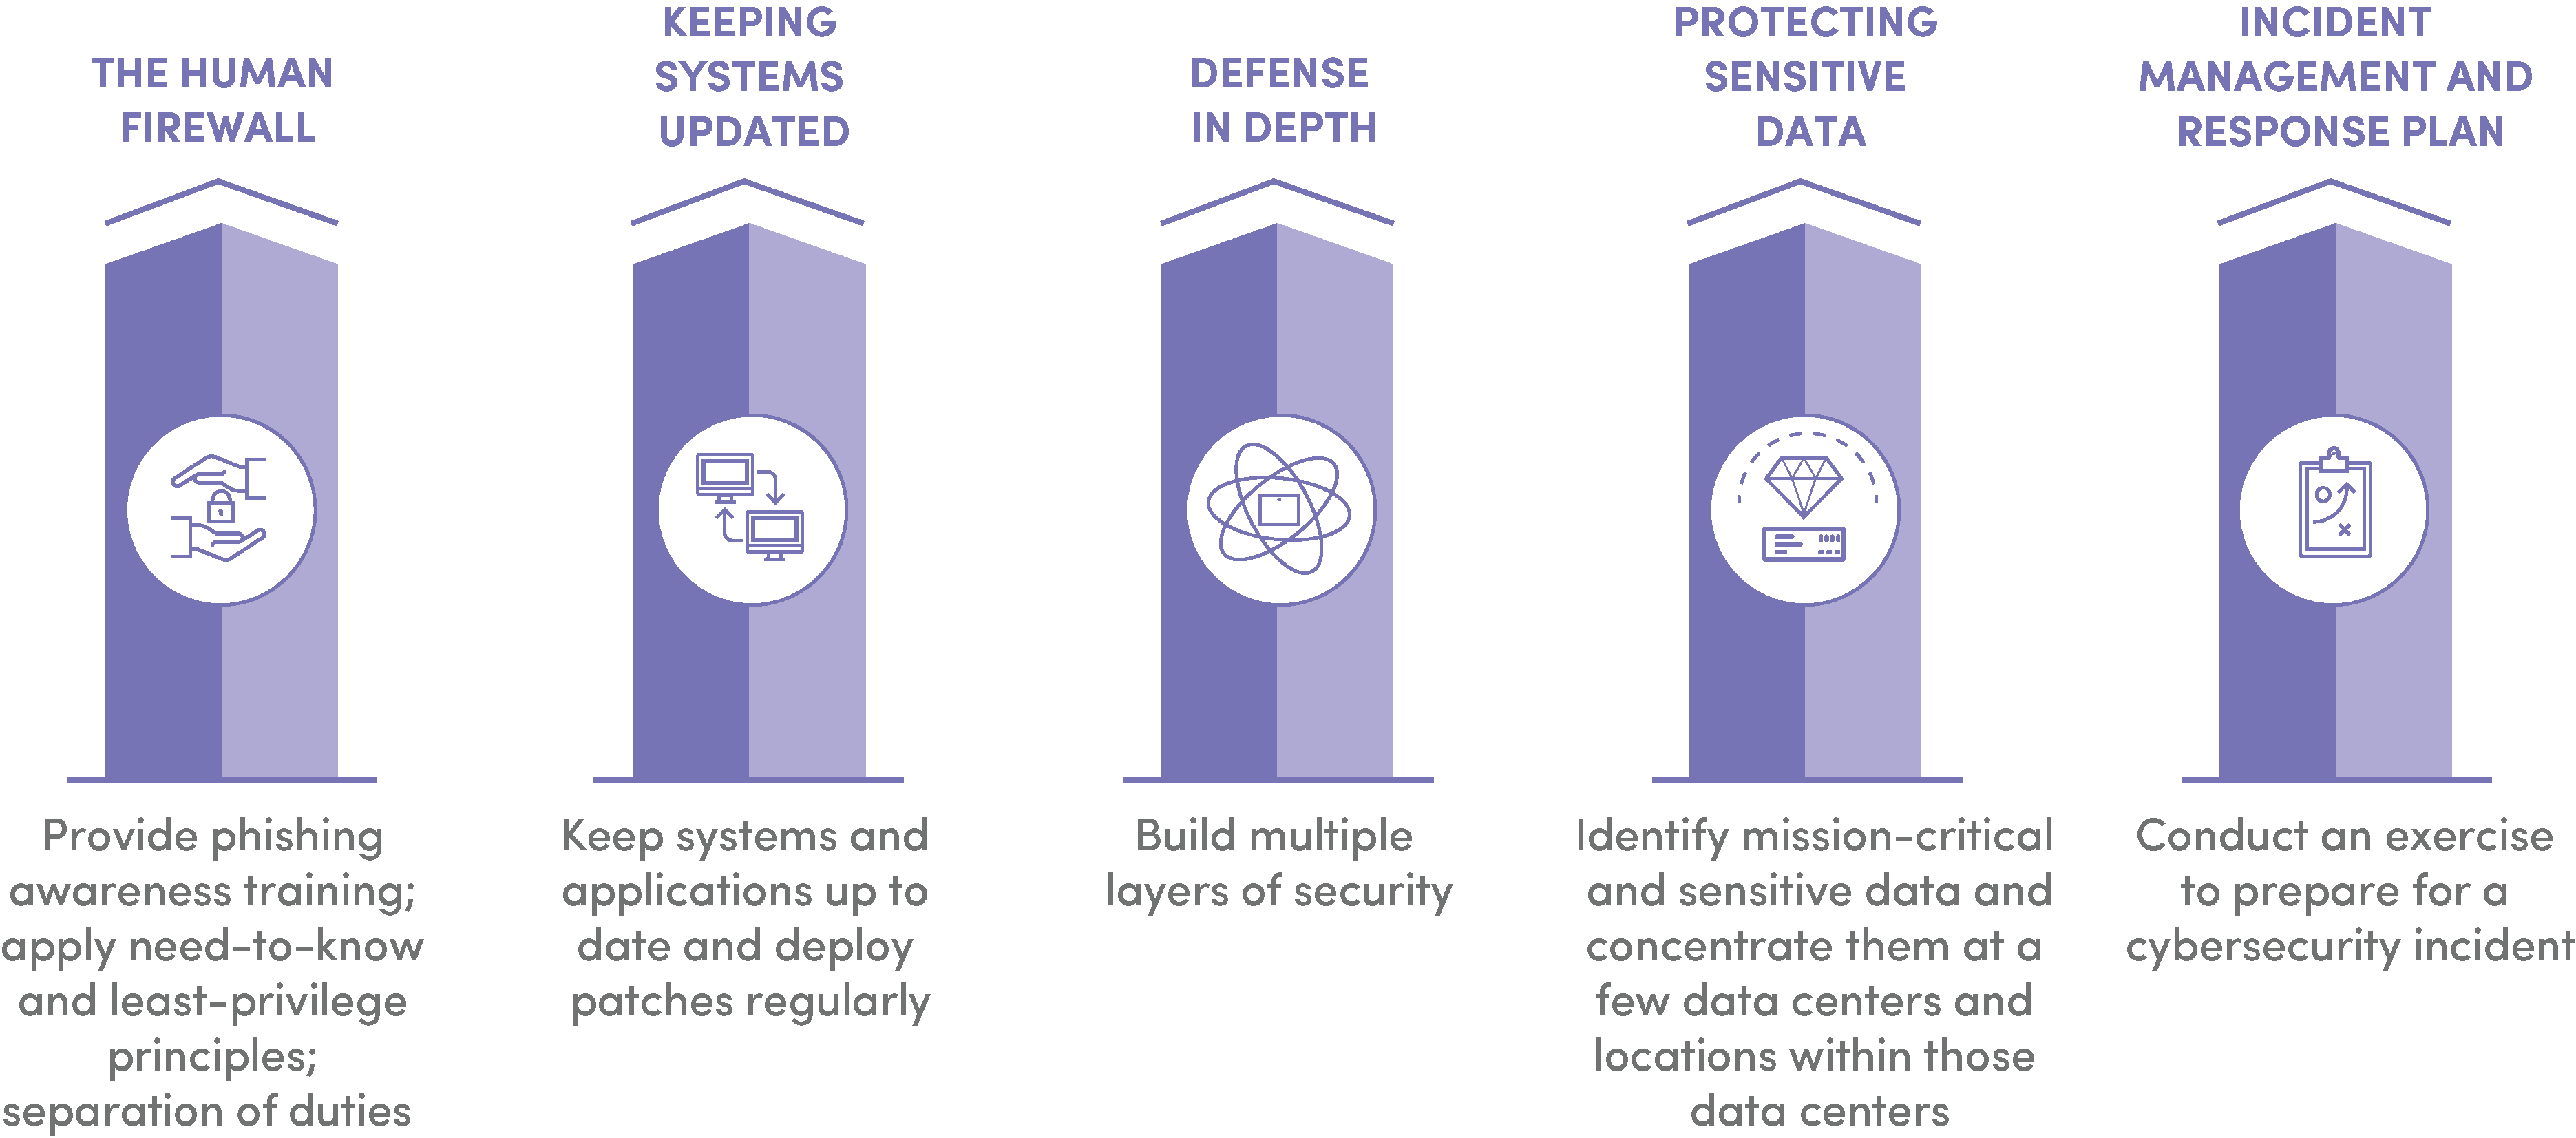 5 Pillars of Cybersercurity